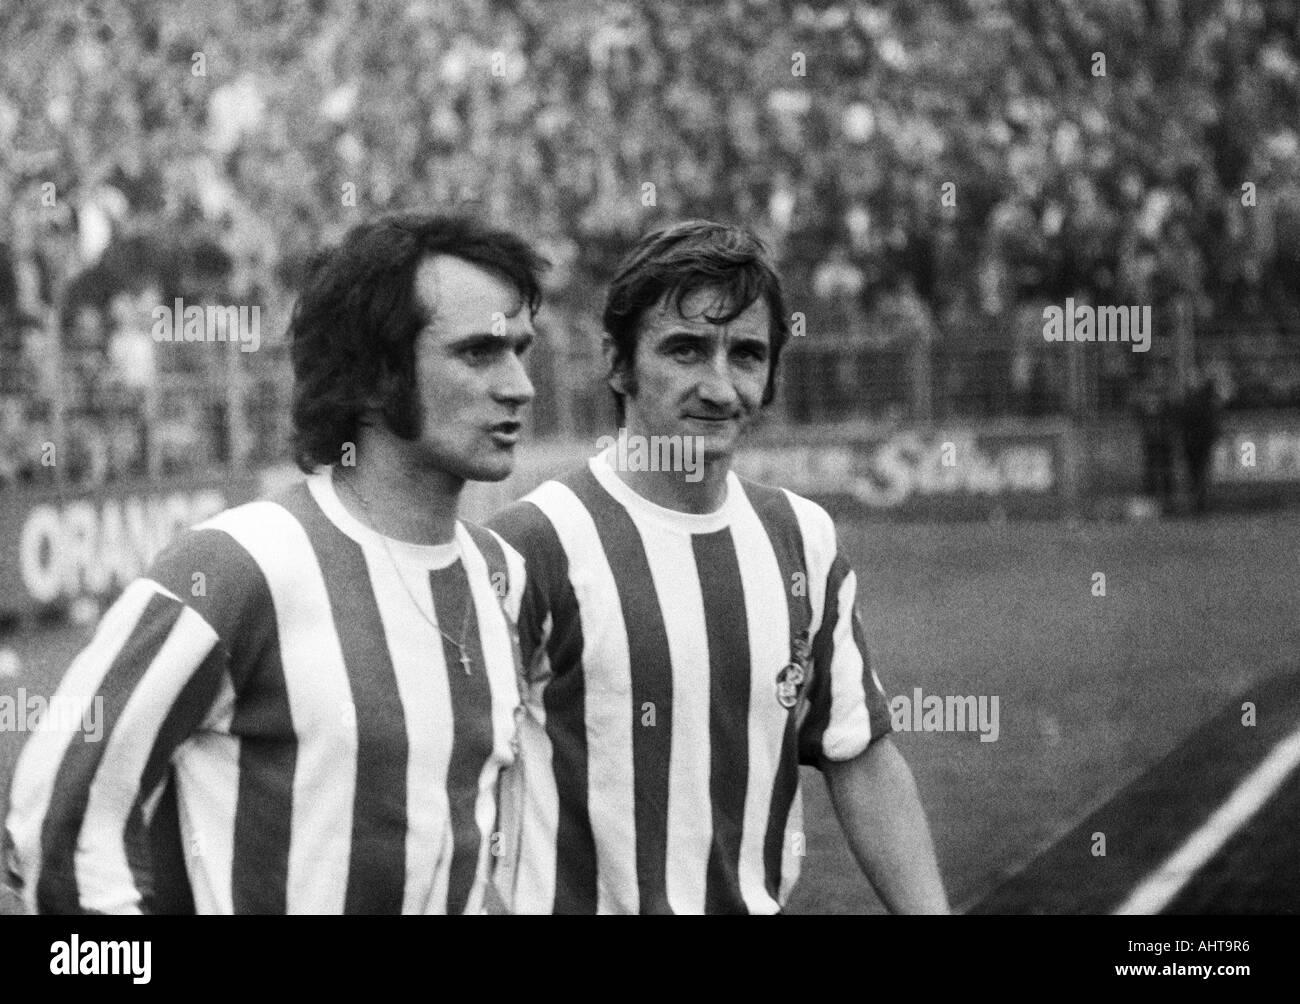 football, Bundesliga, 1971/1972, VfL Bochum versus 1. FC Cologne 1:5, Stadium at the Castroper Strasse in Bochum, football players, left Wolfgang Overath, right Hannes Loehr (both Koeln) - Stock Image